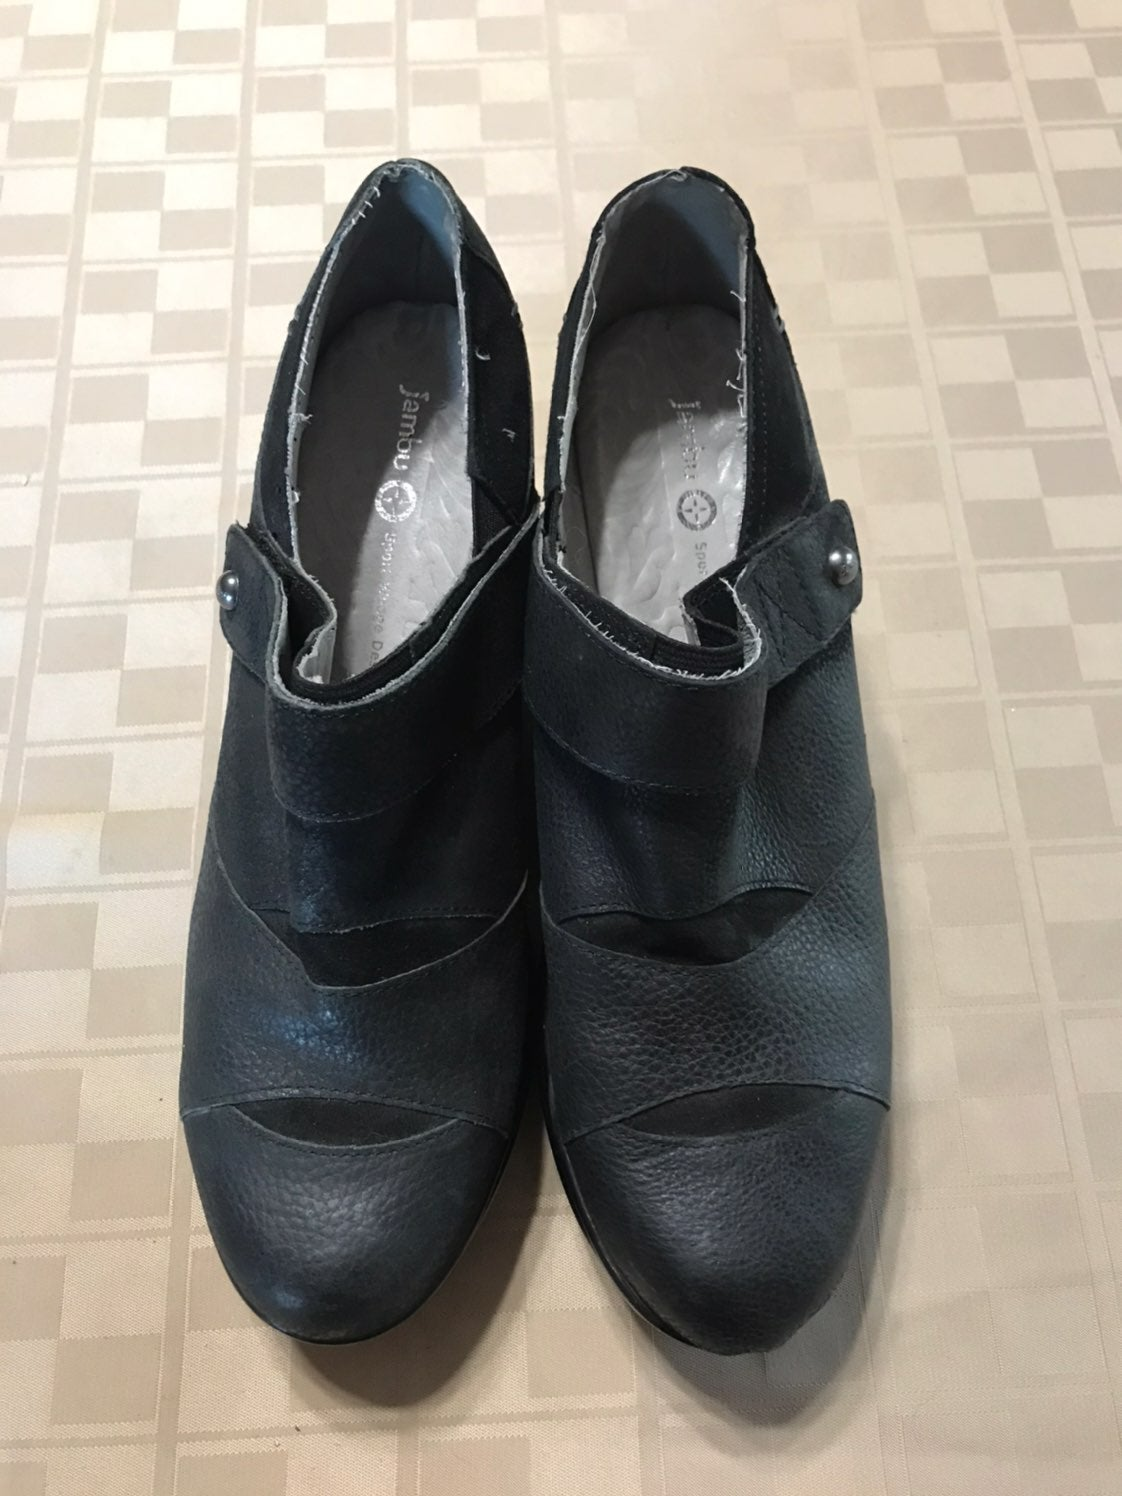 "Sport Wedge Black Leather 3.5"" Heel"